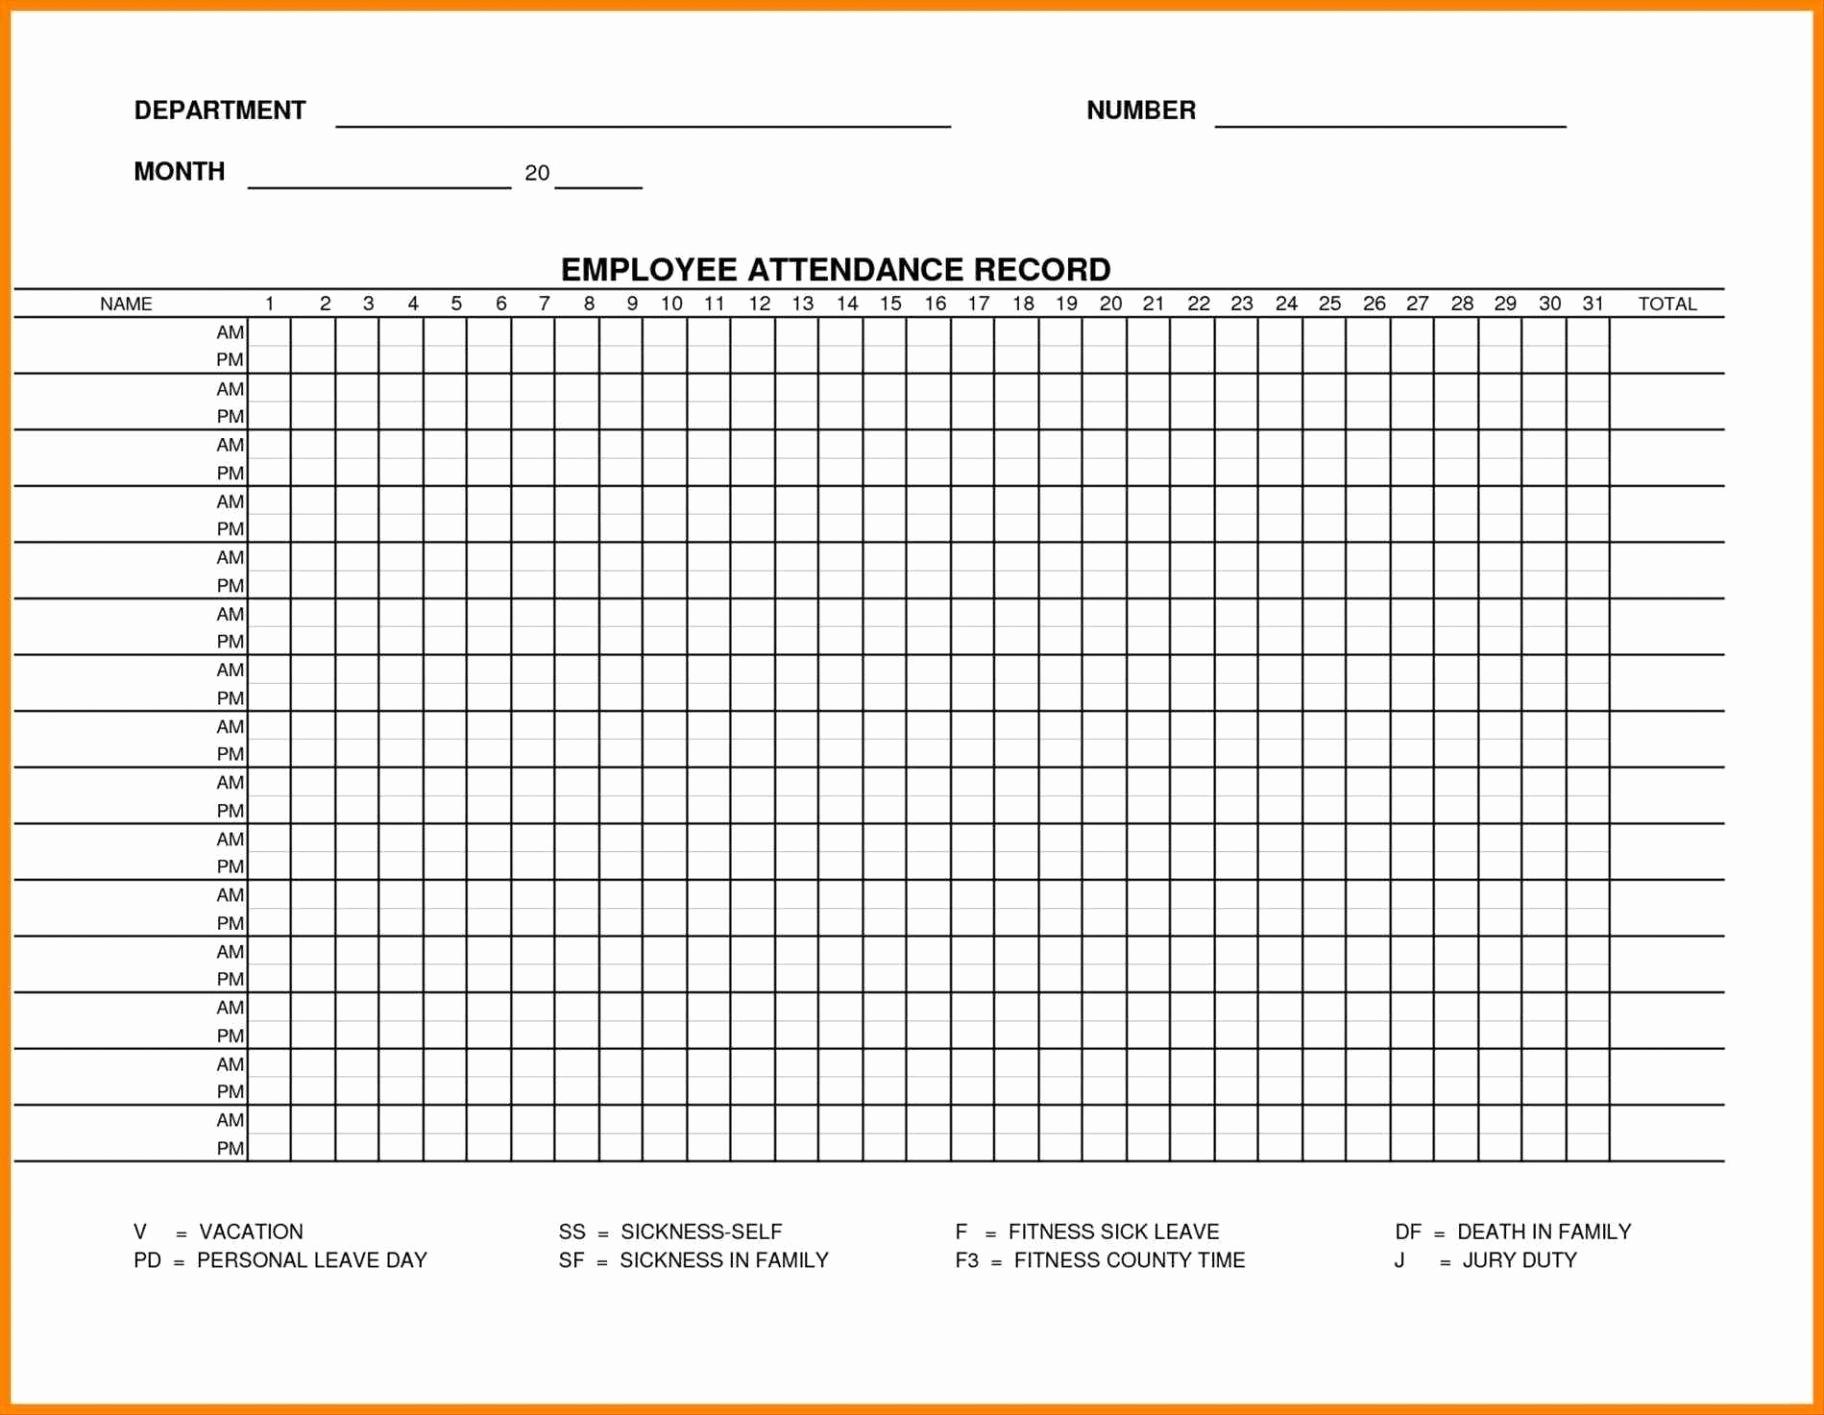 Attendance Calendar For Academic Year Free Printable Printable inside Free Printable Employee Attendance Calendars